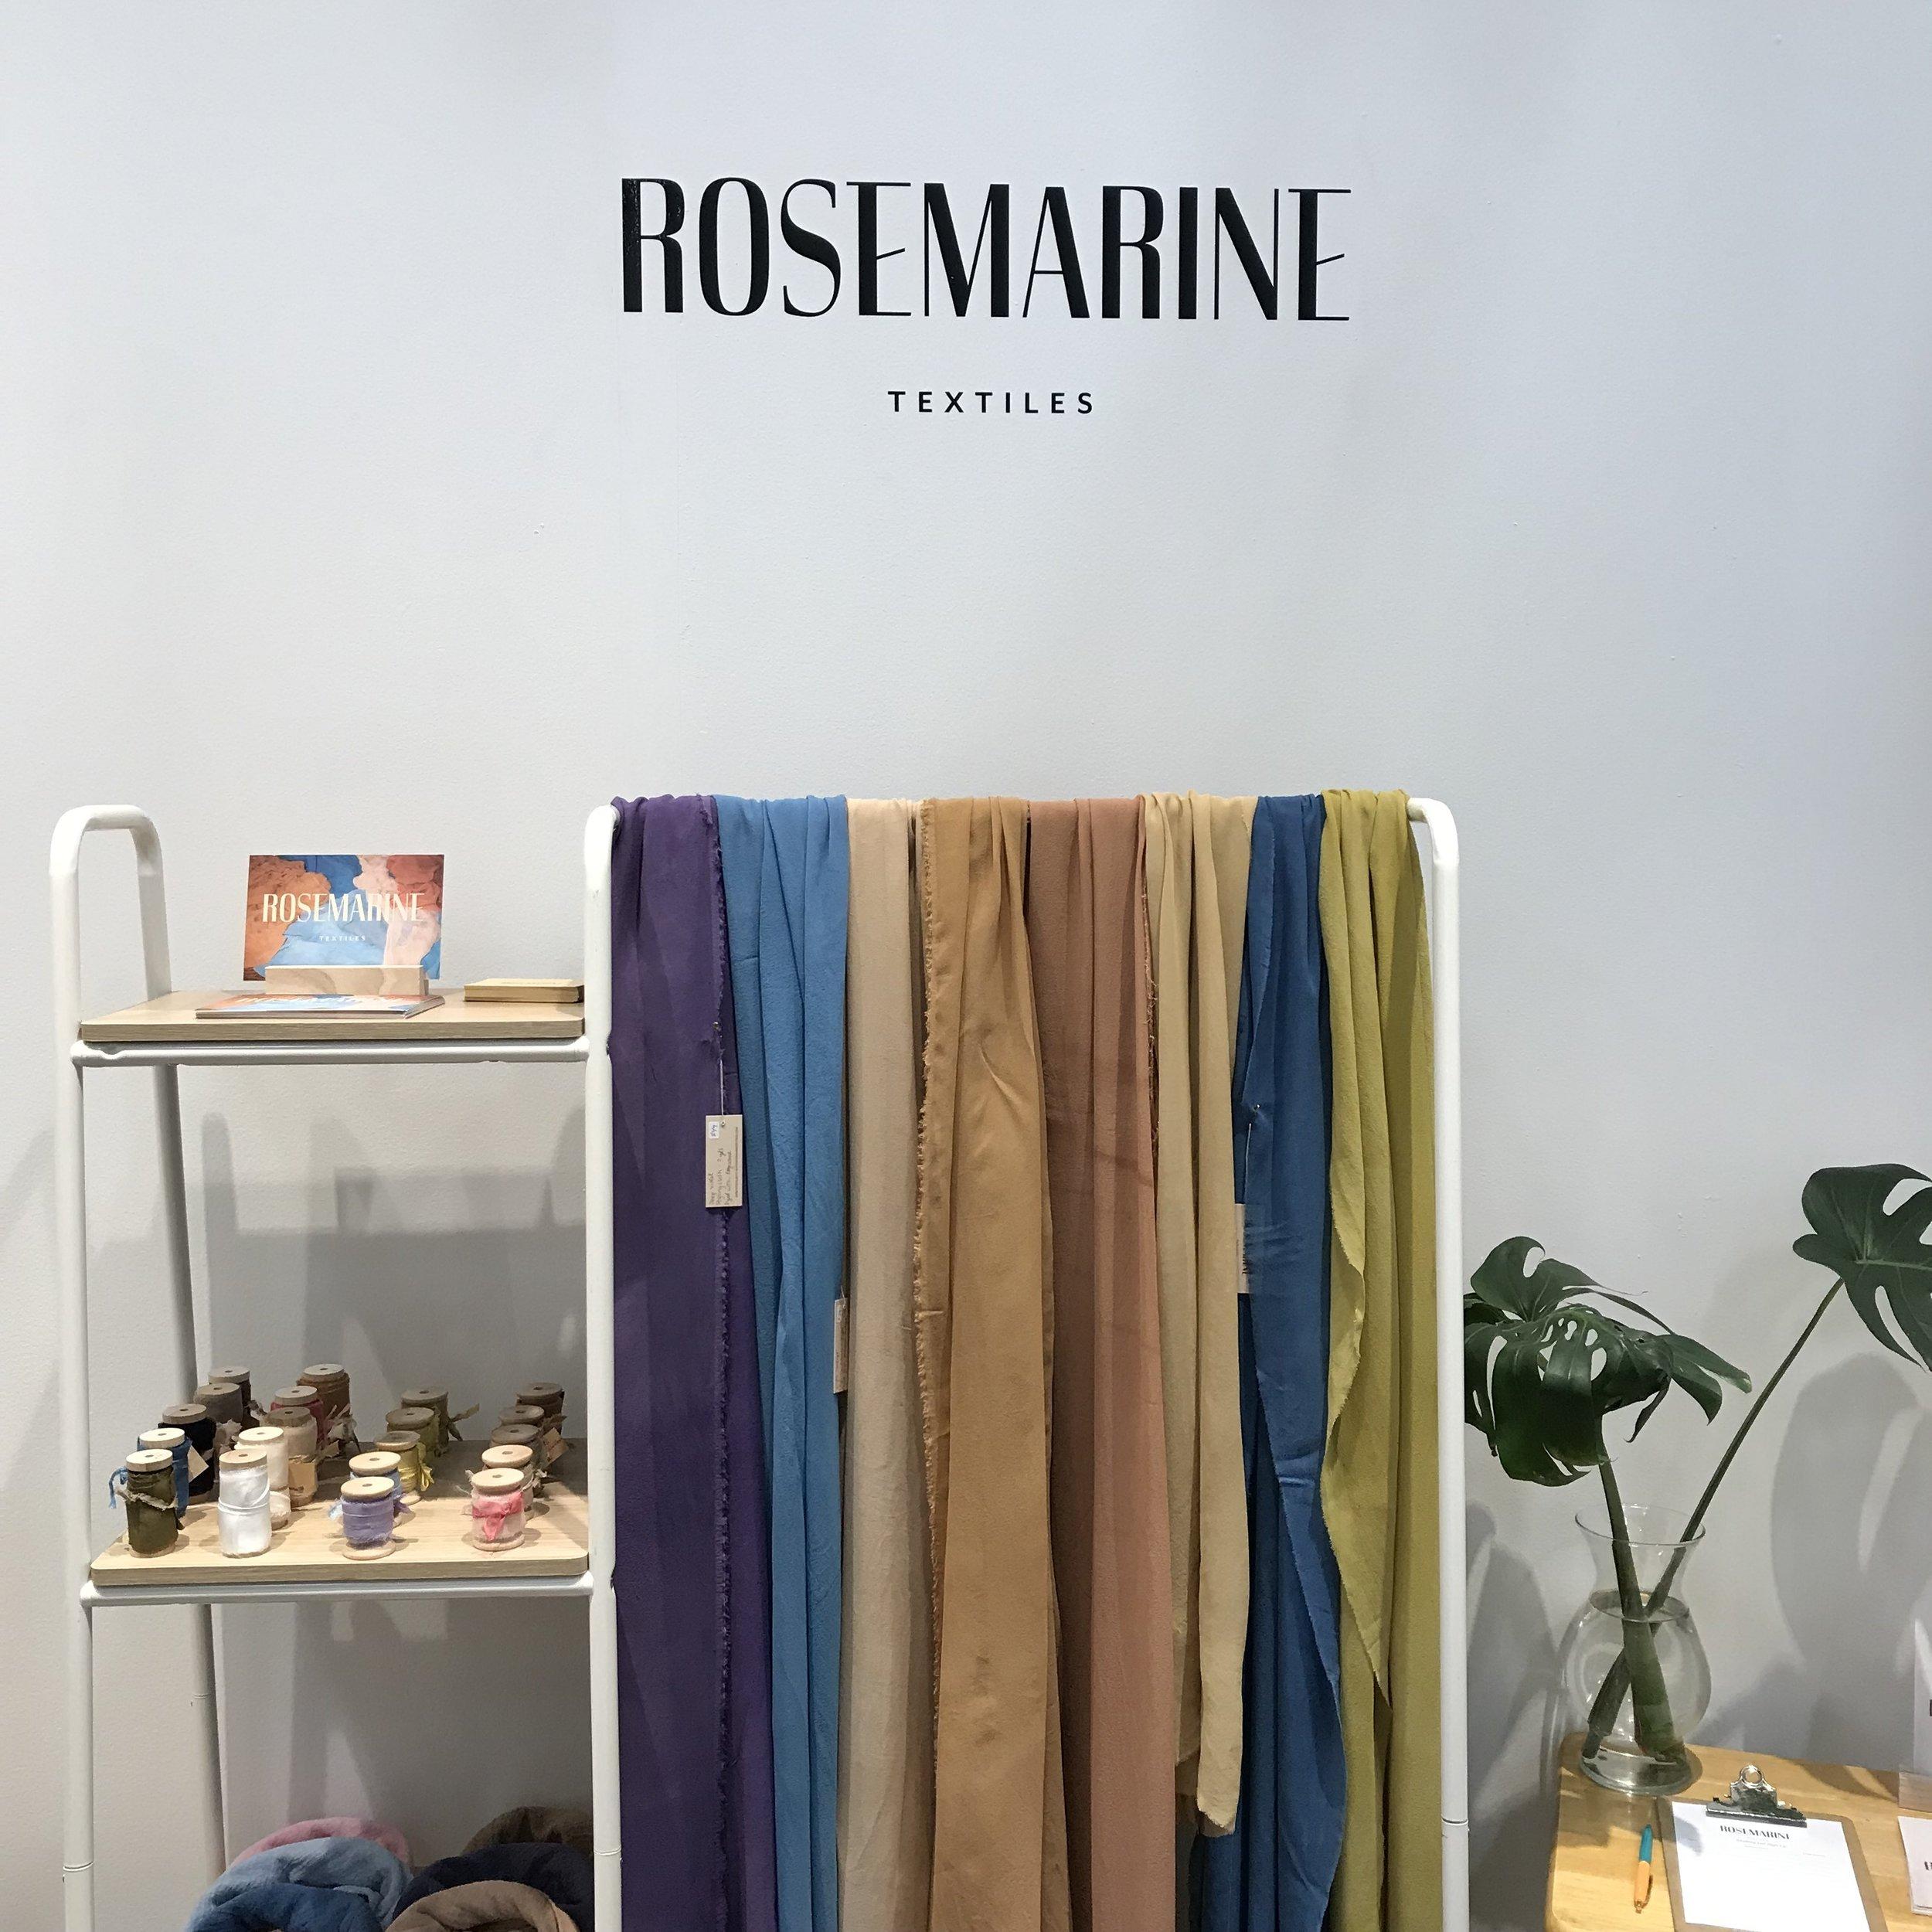 Rosemarine Textiles booth - ribbons, styling cloths, and bandanas.